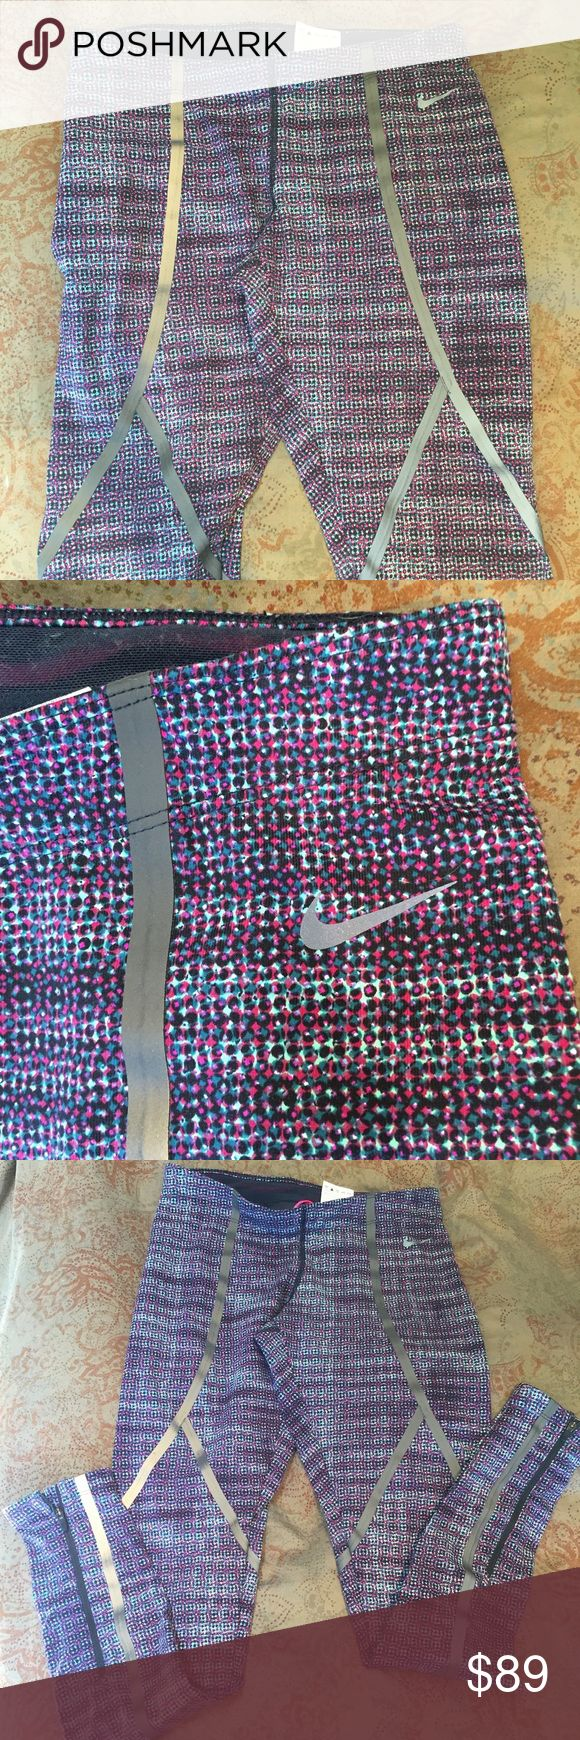 Nike Running Tights Fuschia/Black/Turquoise Dot Worn twice, EUC. Full length. See description for the black and white pair! Nike Pants Leggings